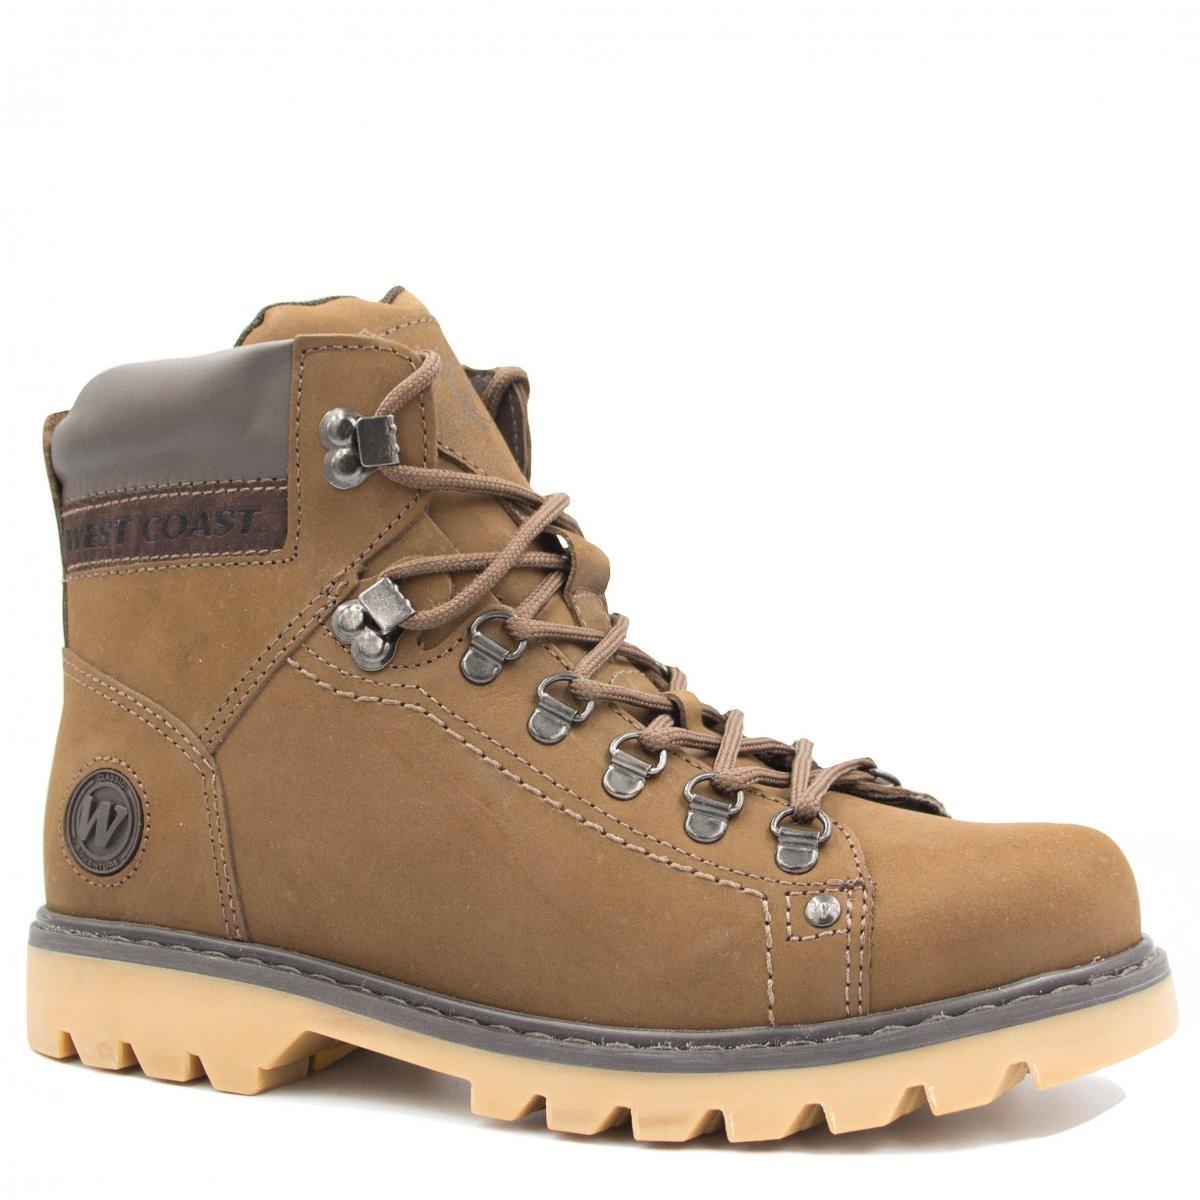 1f1a1ceb18 bota masculina west coast adventure worker classic 5790. Carregando zoom.